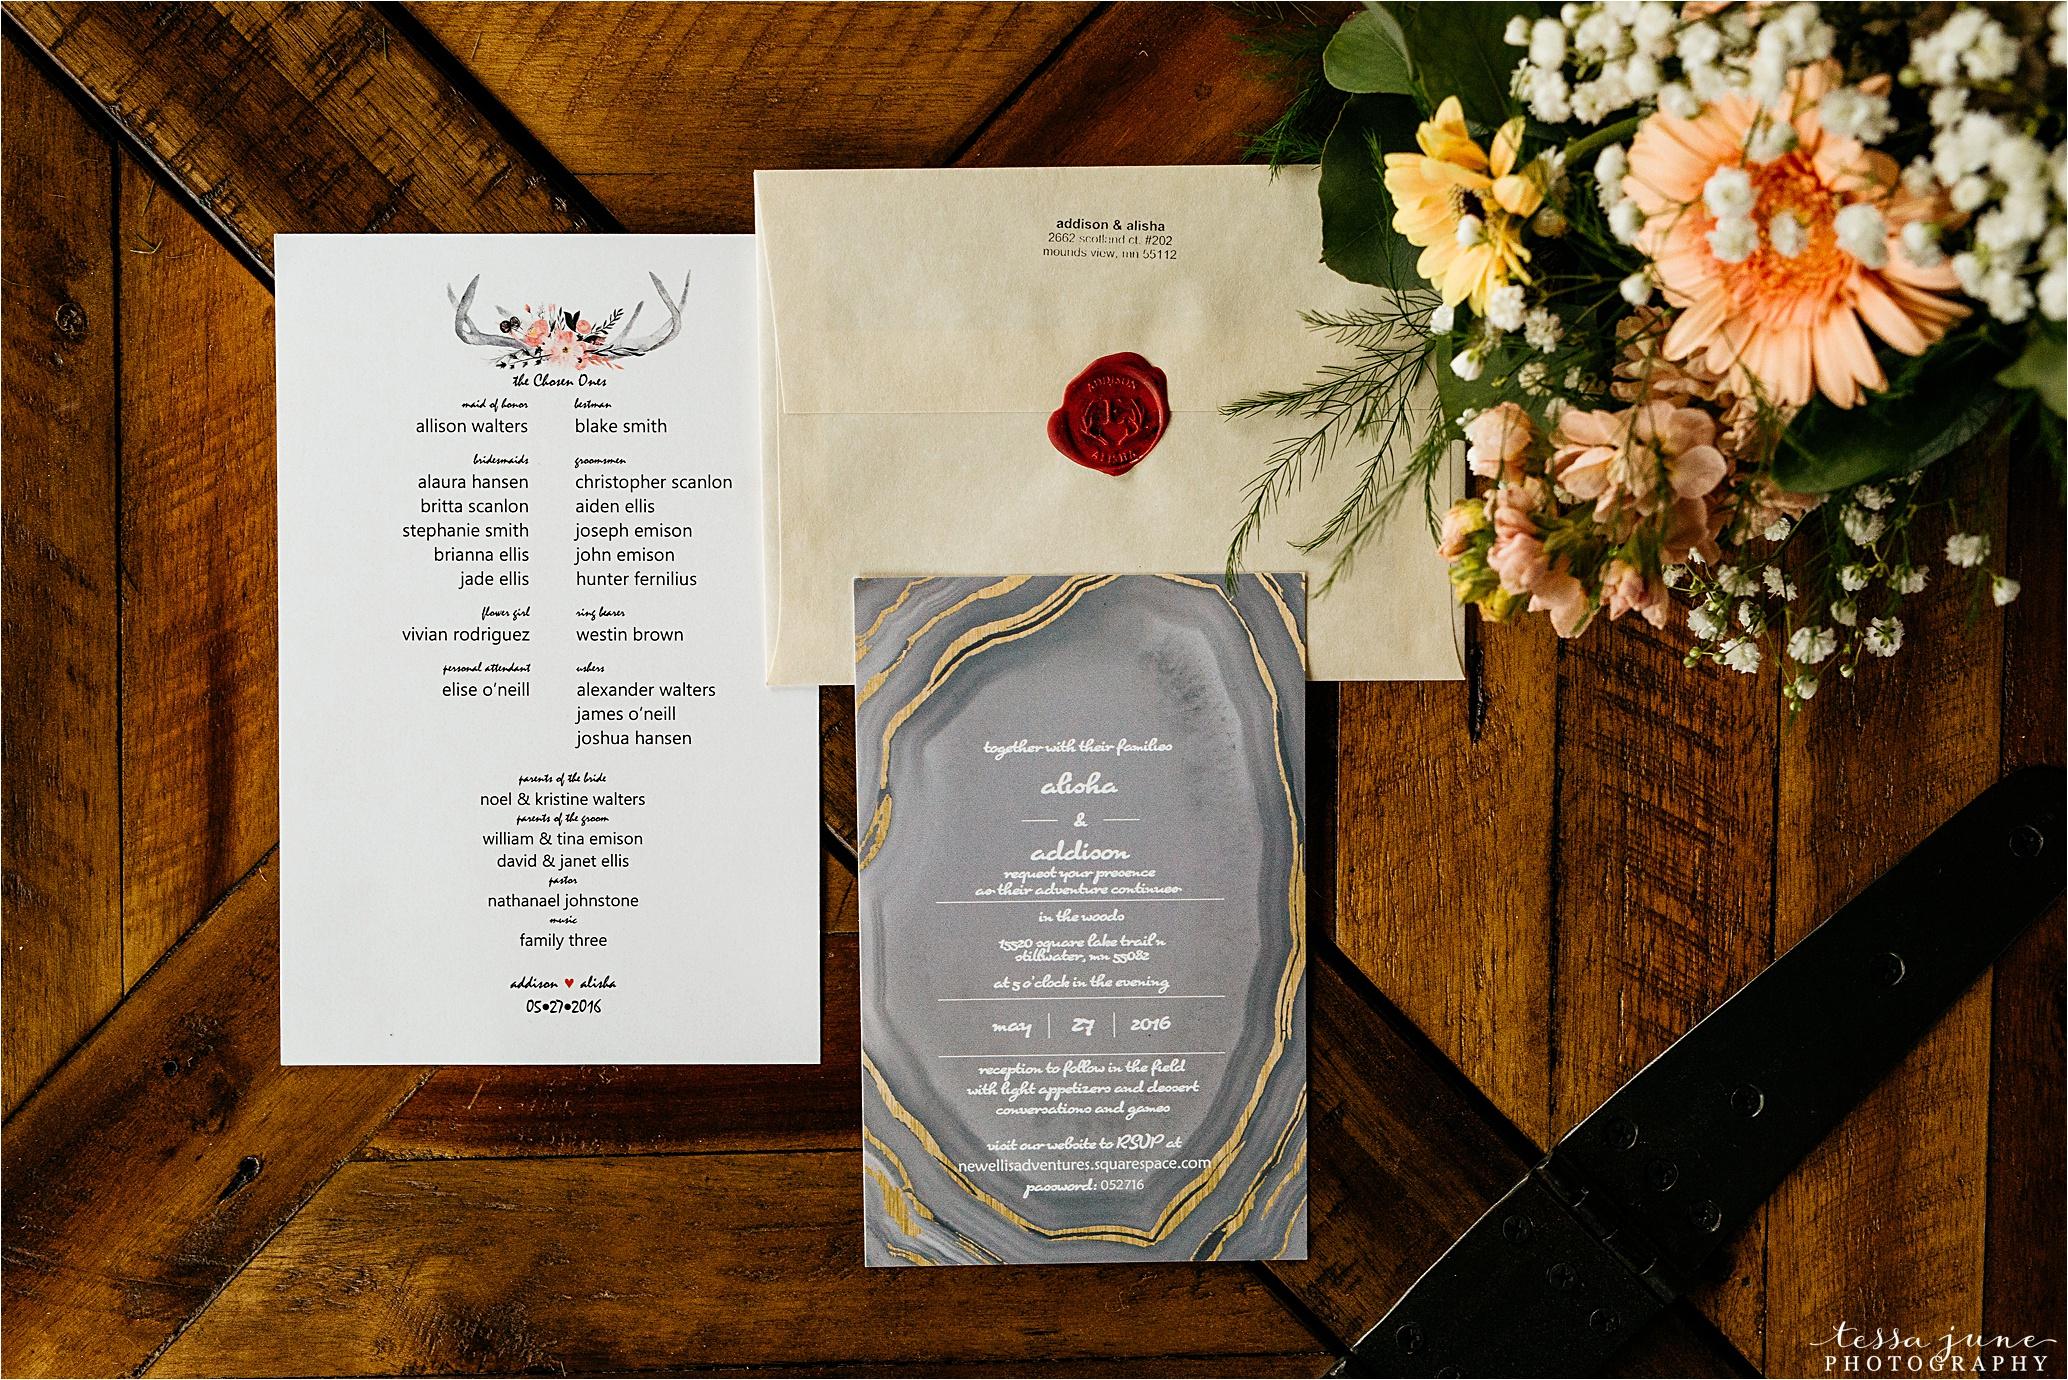 bohemian-forest-wedding-stillwater-minnesota-flower-crown-st-cloud-photographer-invitation